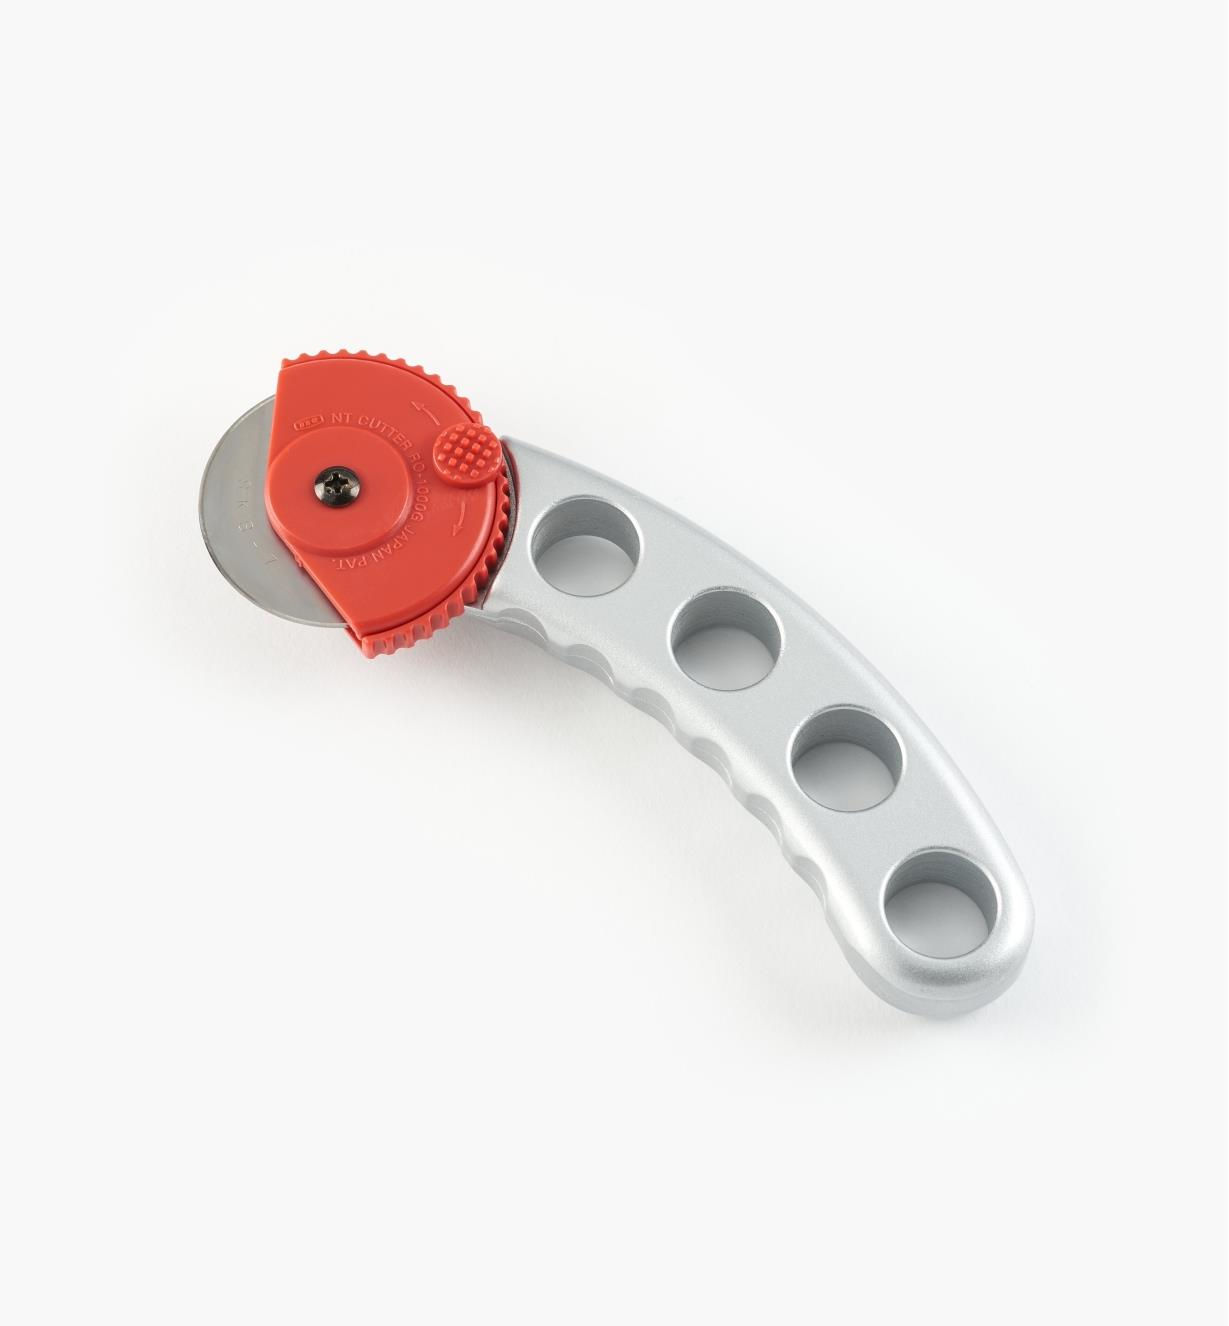 27K0771 - Aluminum Rotary Cutter